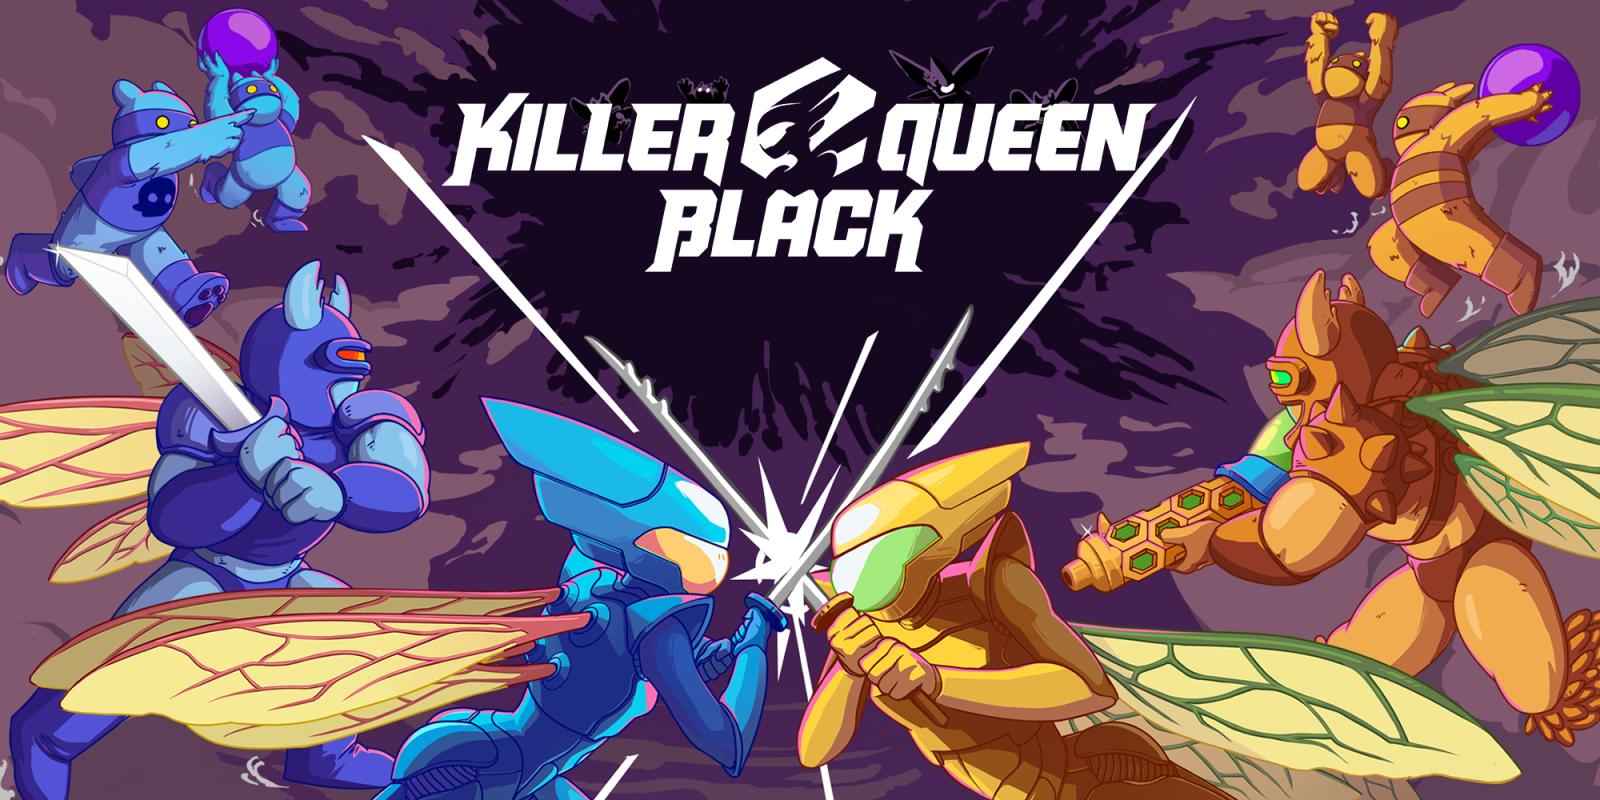 H2x1 NSwitch KillerQueenBlack image1600w Η Nintendo ανακοίνωσε τα παιχνίδια για τη Gamescom 2018   Geekdom News